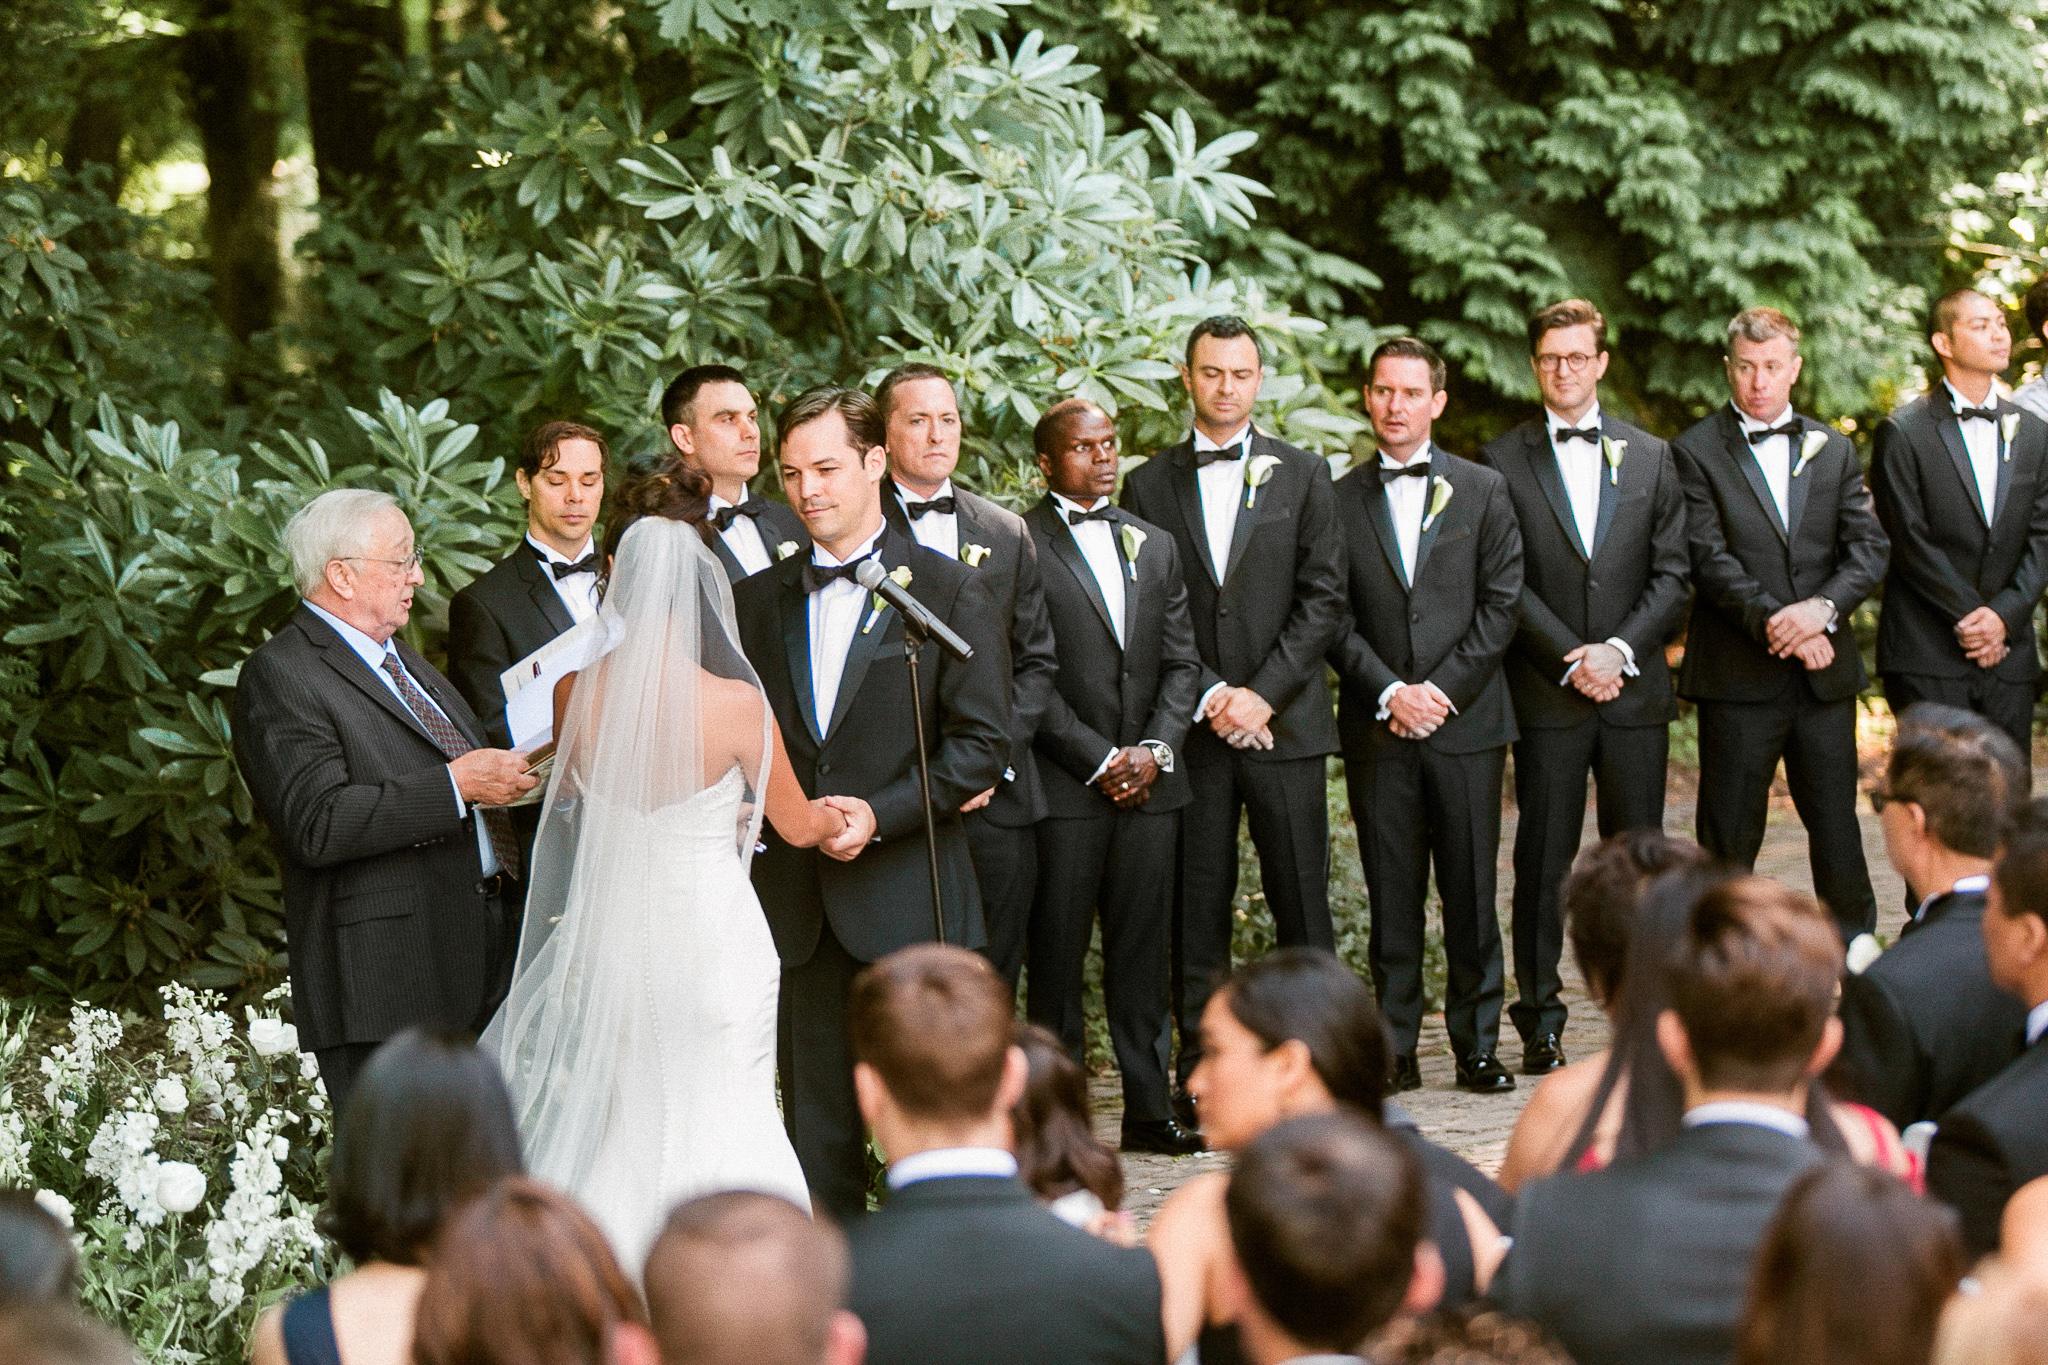 140OutliveCreative_Travel_Photographer_Videographer_Lewis&Clark_Oregon_Elegant_BlackTie_Destination_Wedding.jpg